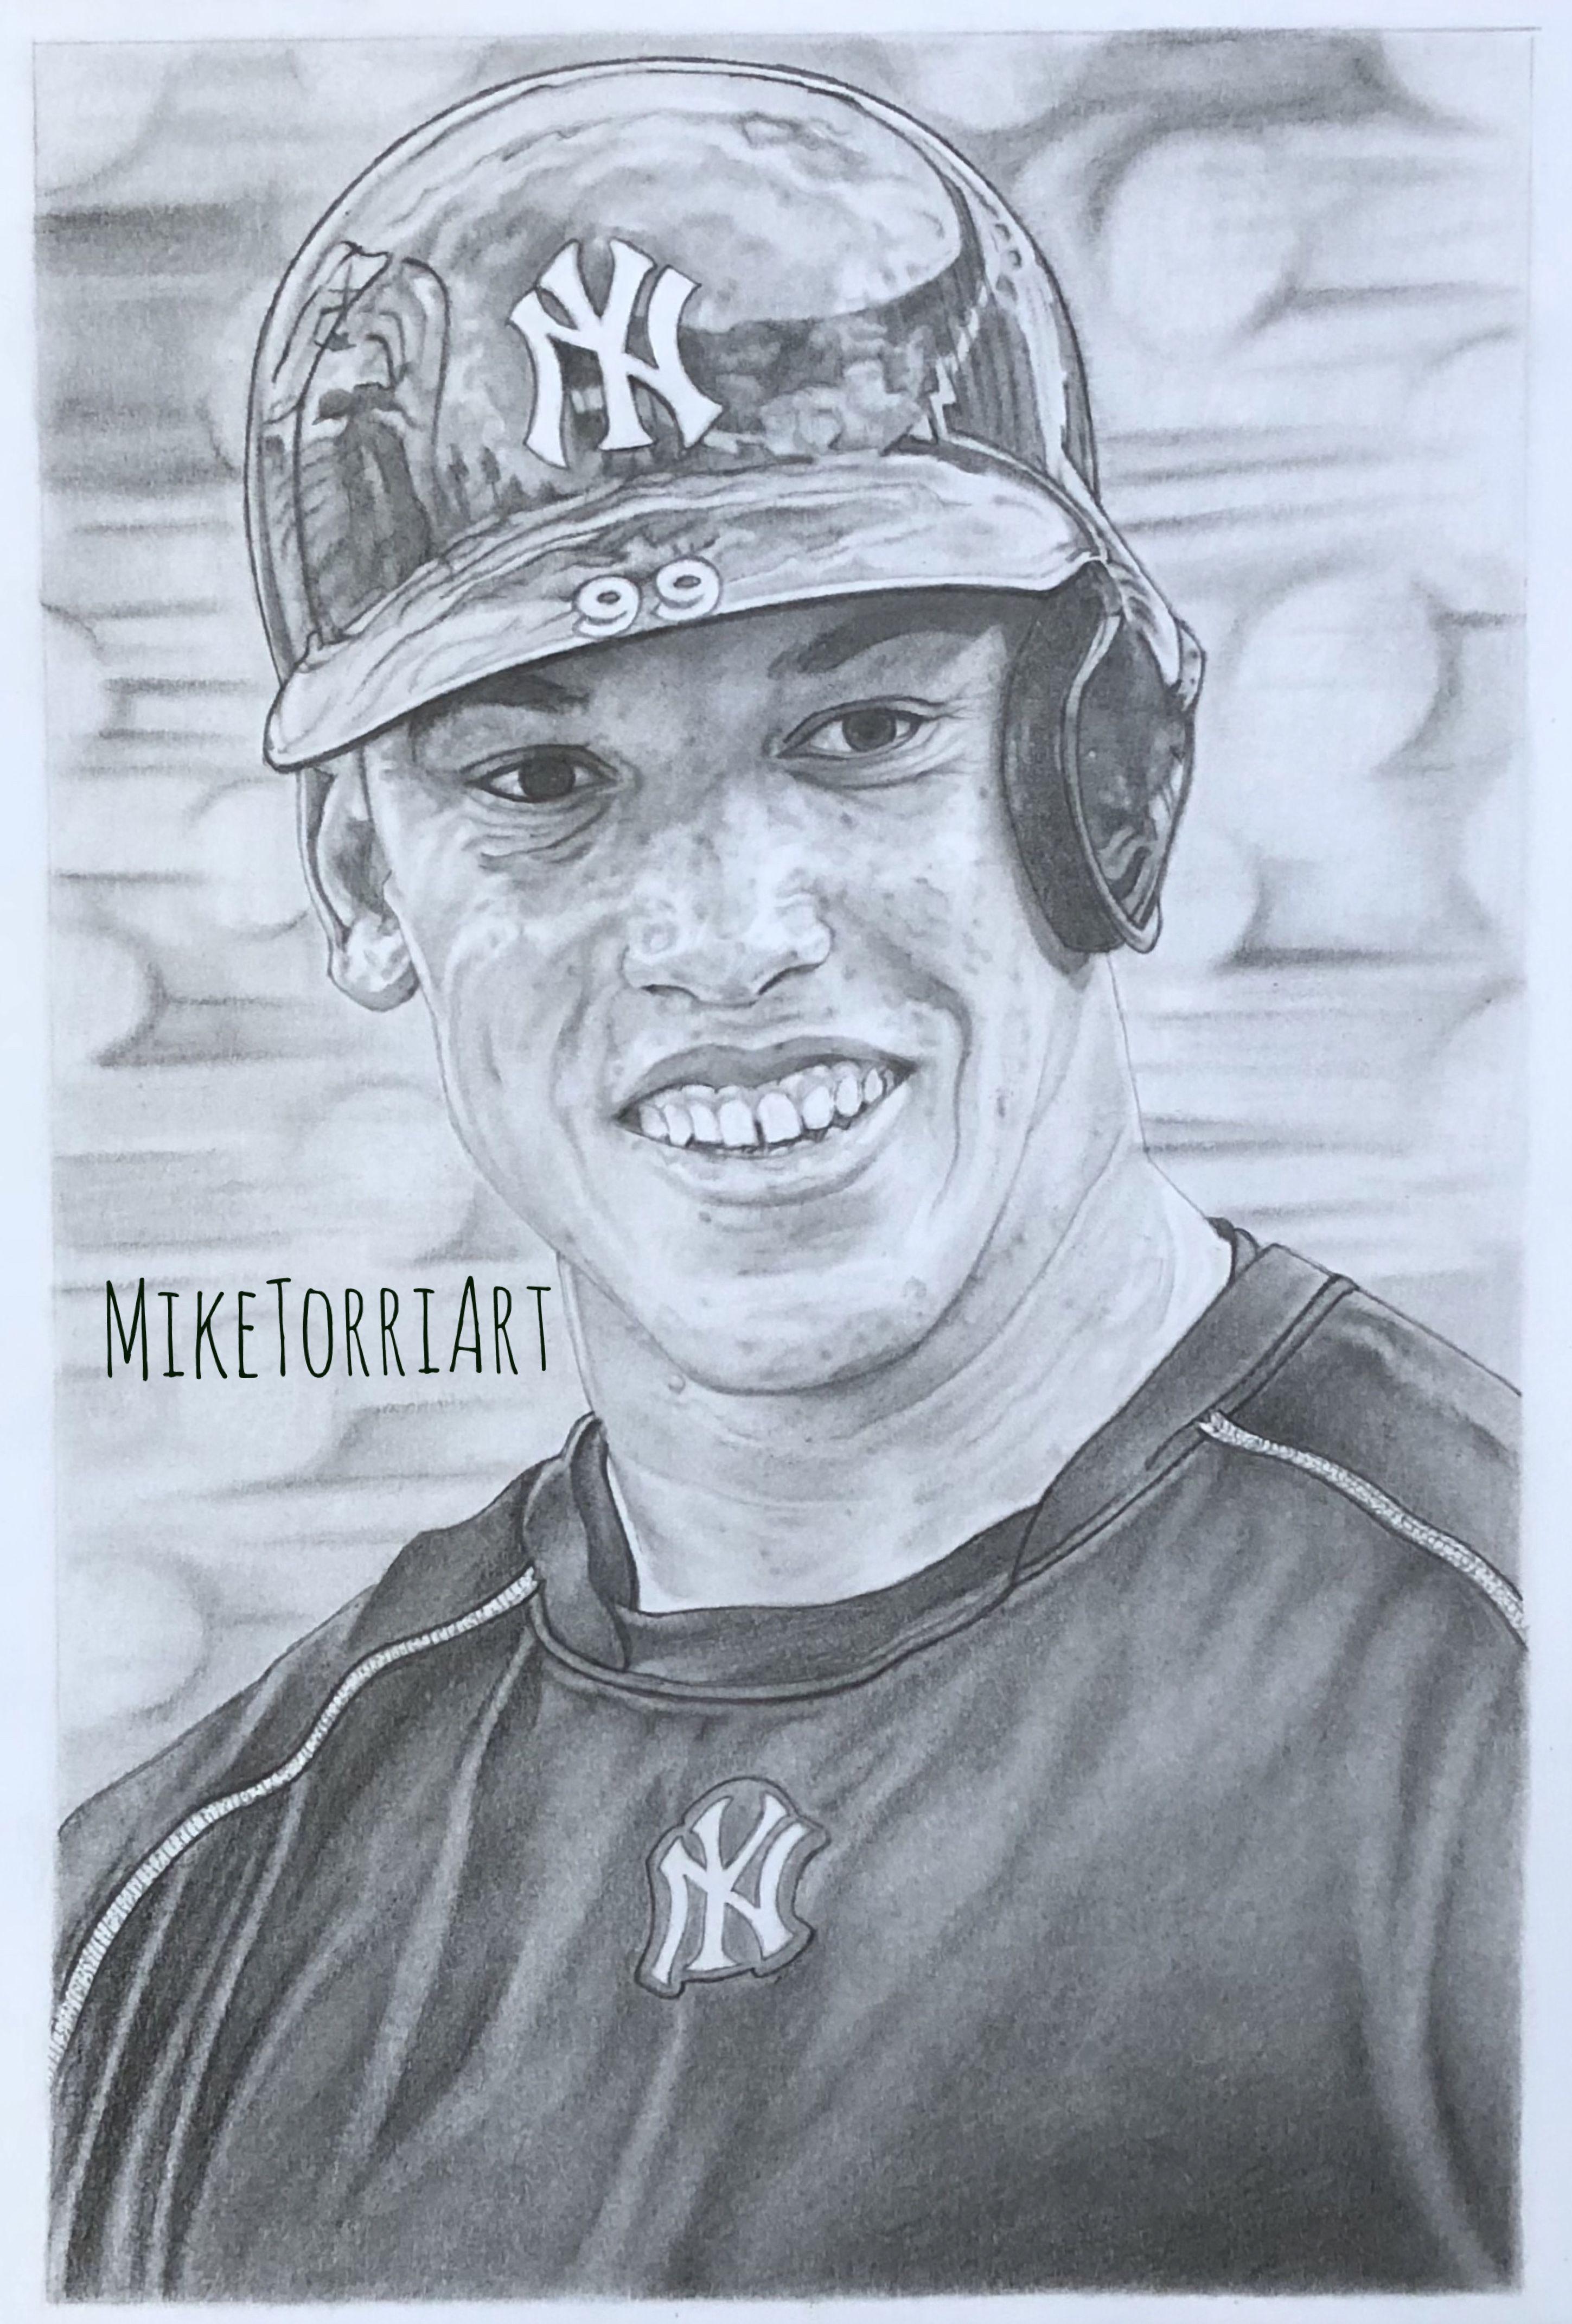 Pencil Drawing Of New York Yankees Slugger Aaron Judge Aaronjudge Yankees Bronxbomber Miketorriart Painted Hats Colored Pencil Portrait Print